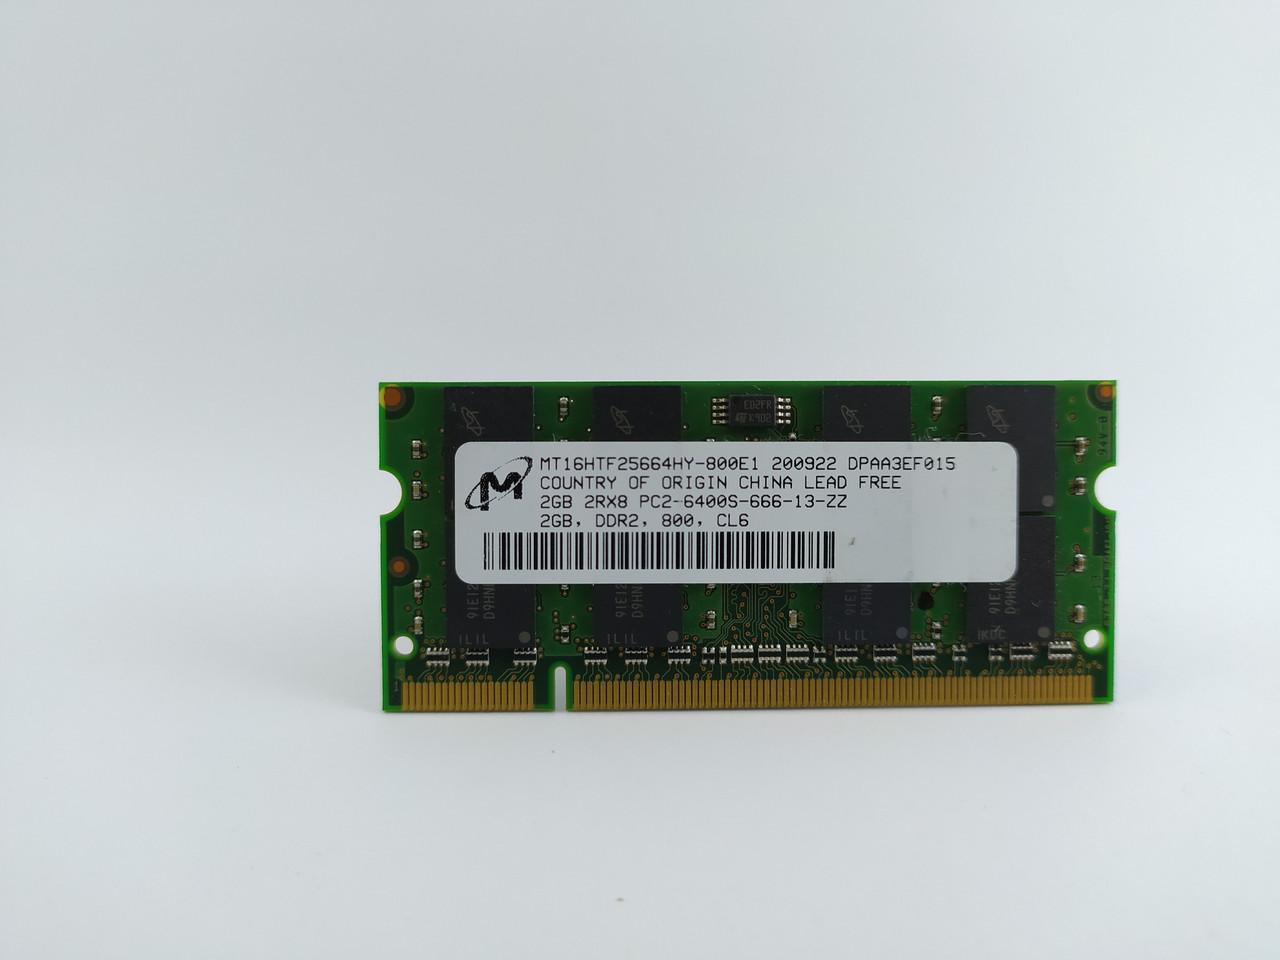 Оперативная память для ноутбука SODIMM Micron DDR2 2Gb 800MHz PC2-6400S (MT16HTF25664HY-800E1) Б/У